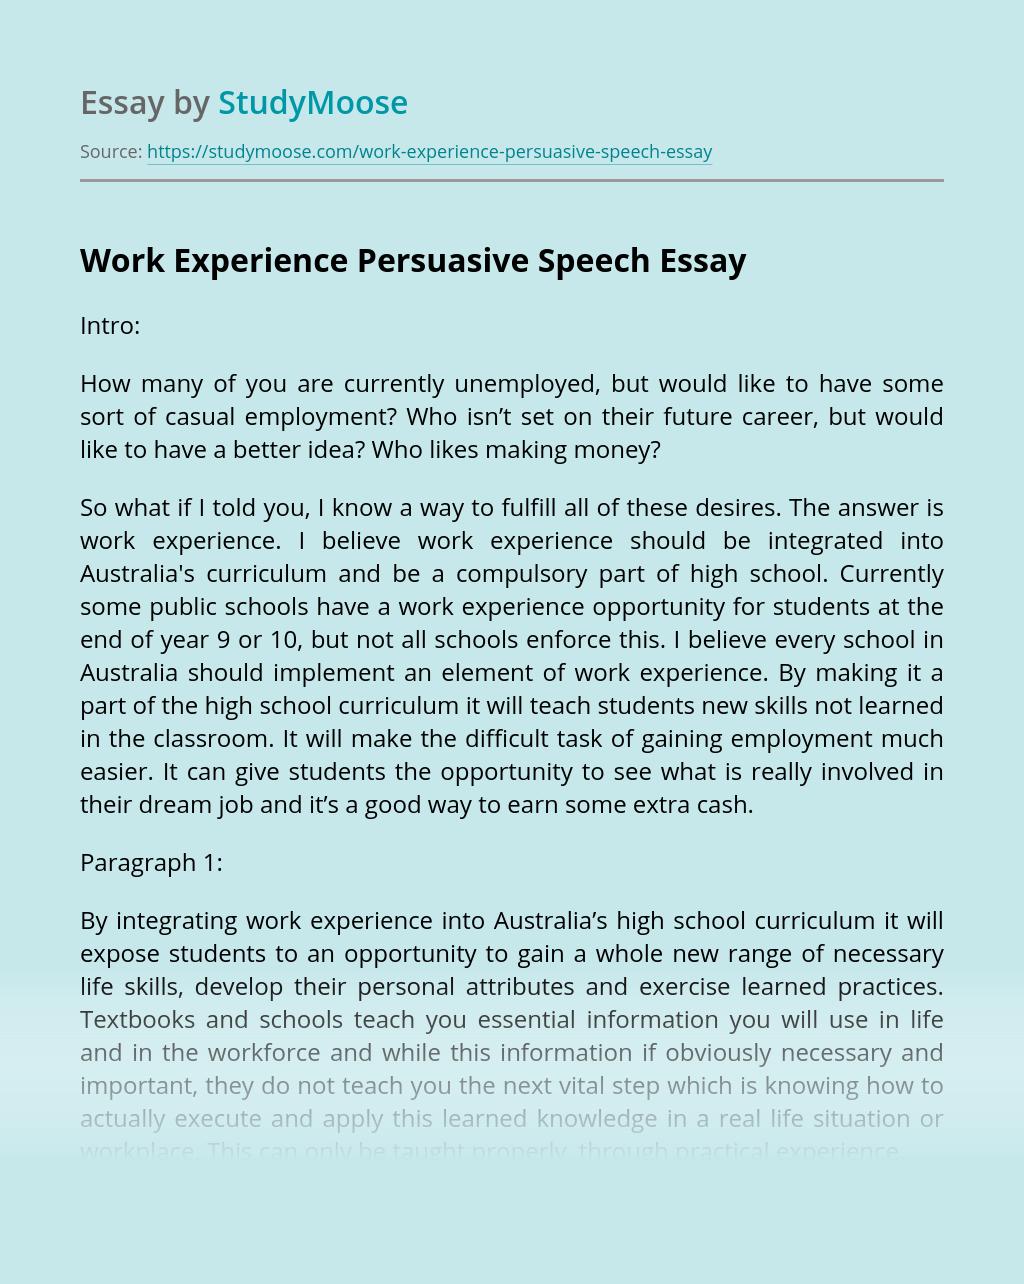 Work Experience Persuasive Speech